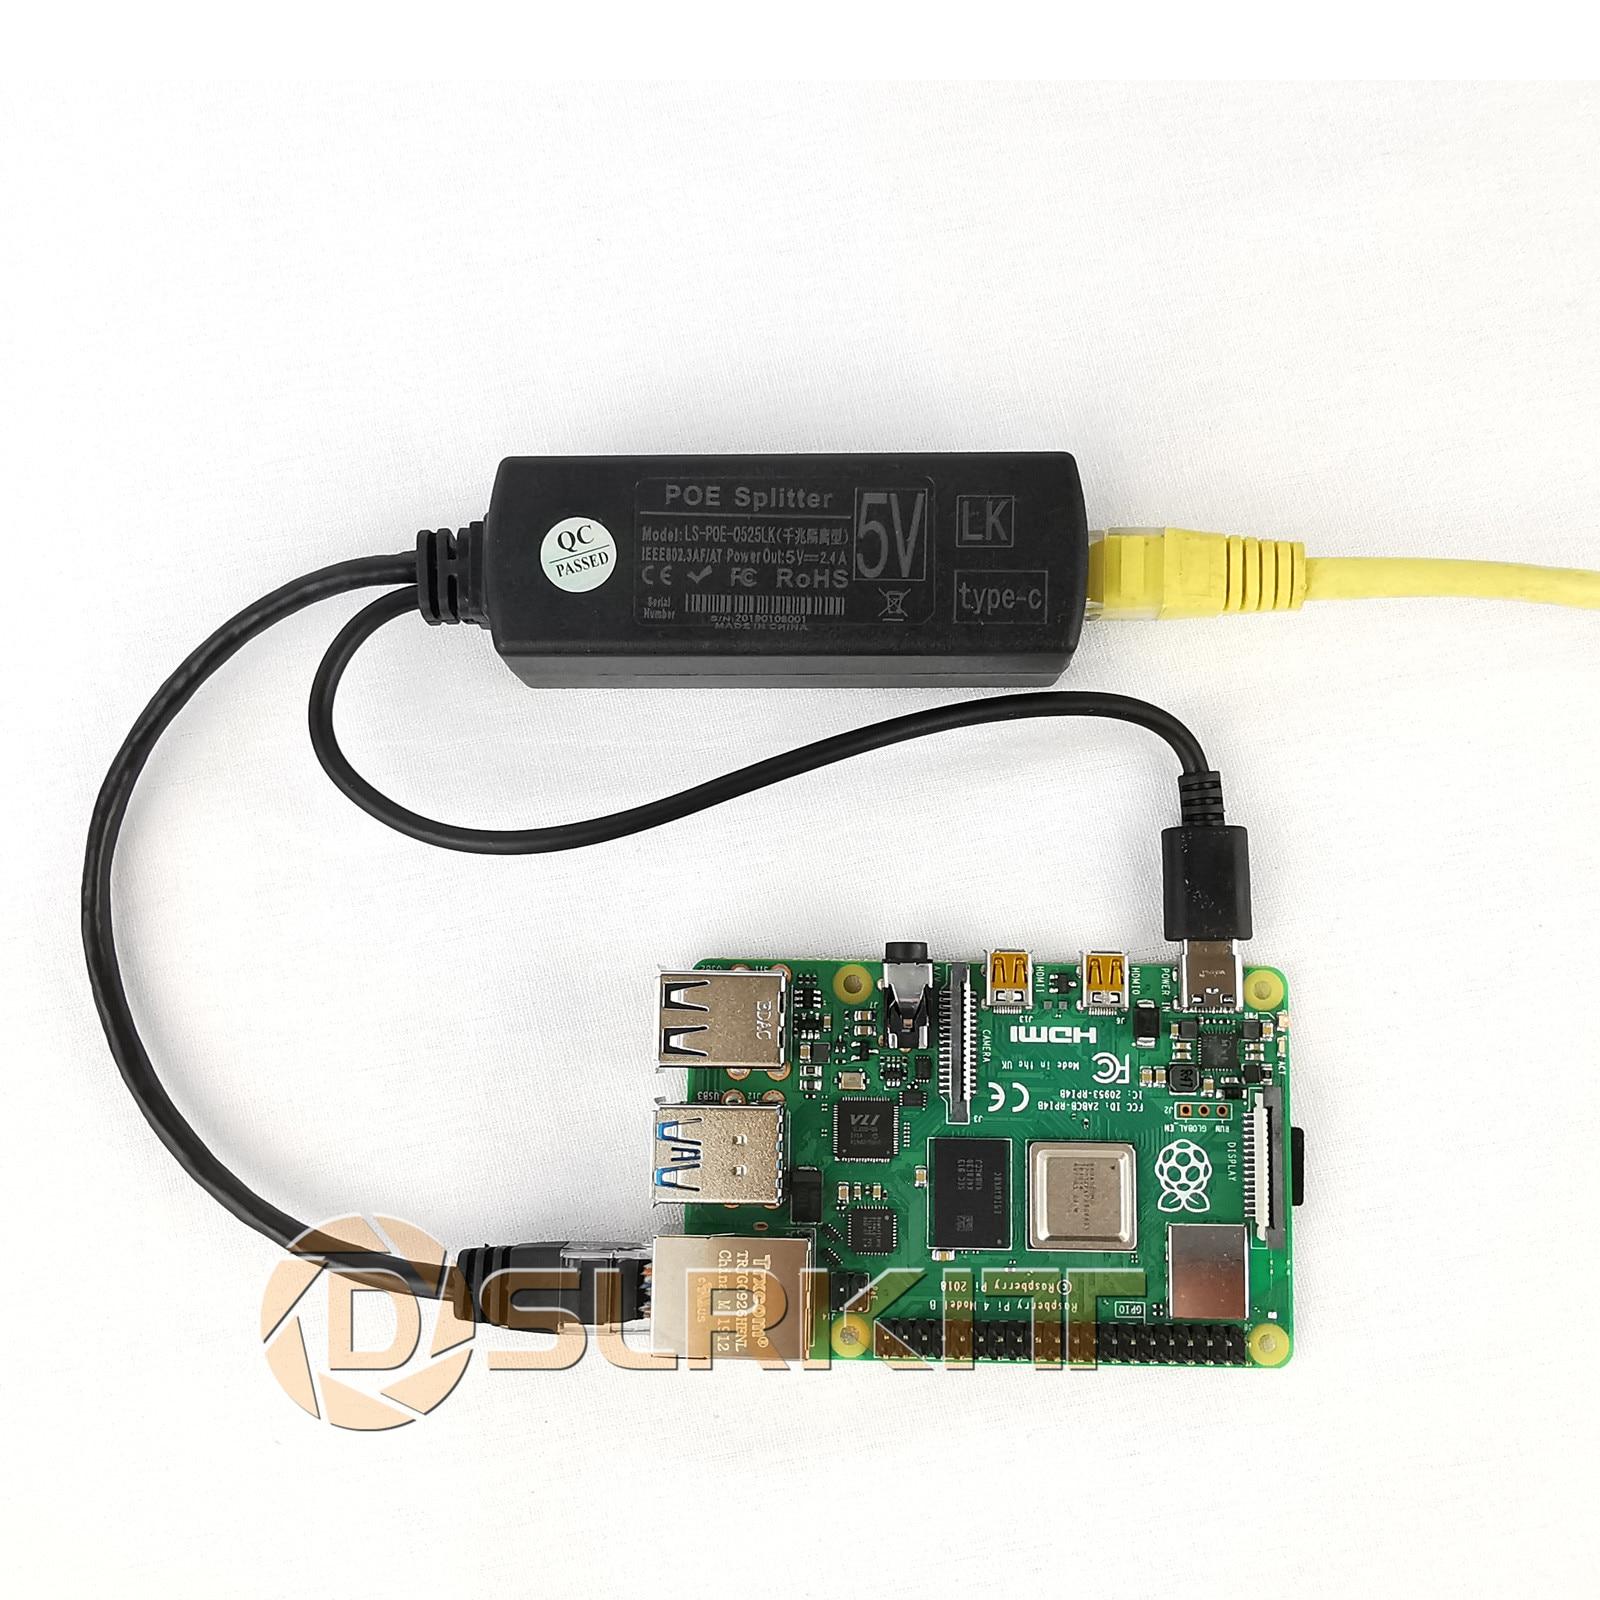 Gigabit raspberry pi 4 4b ativo poe divisor usb tipo c 5 v power over ethernet